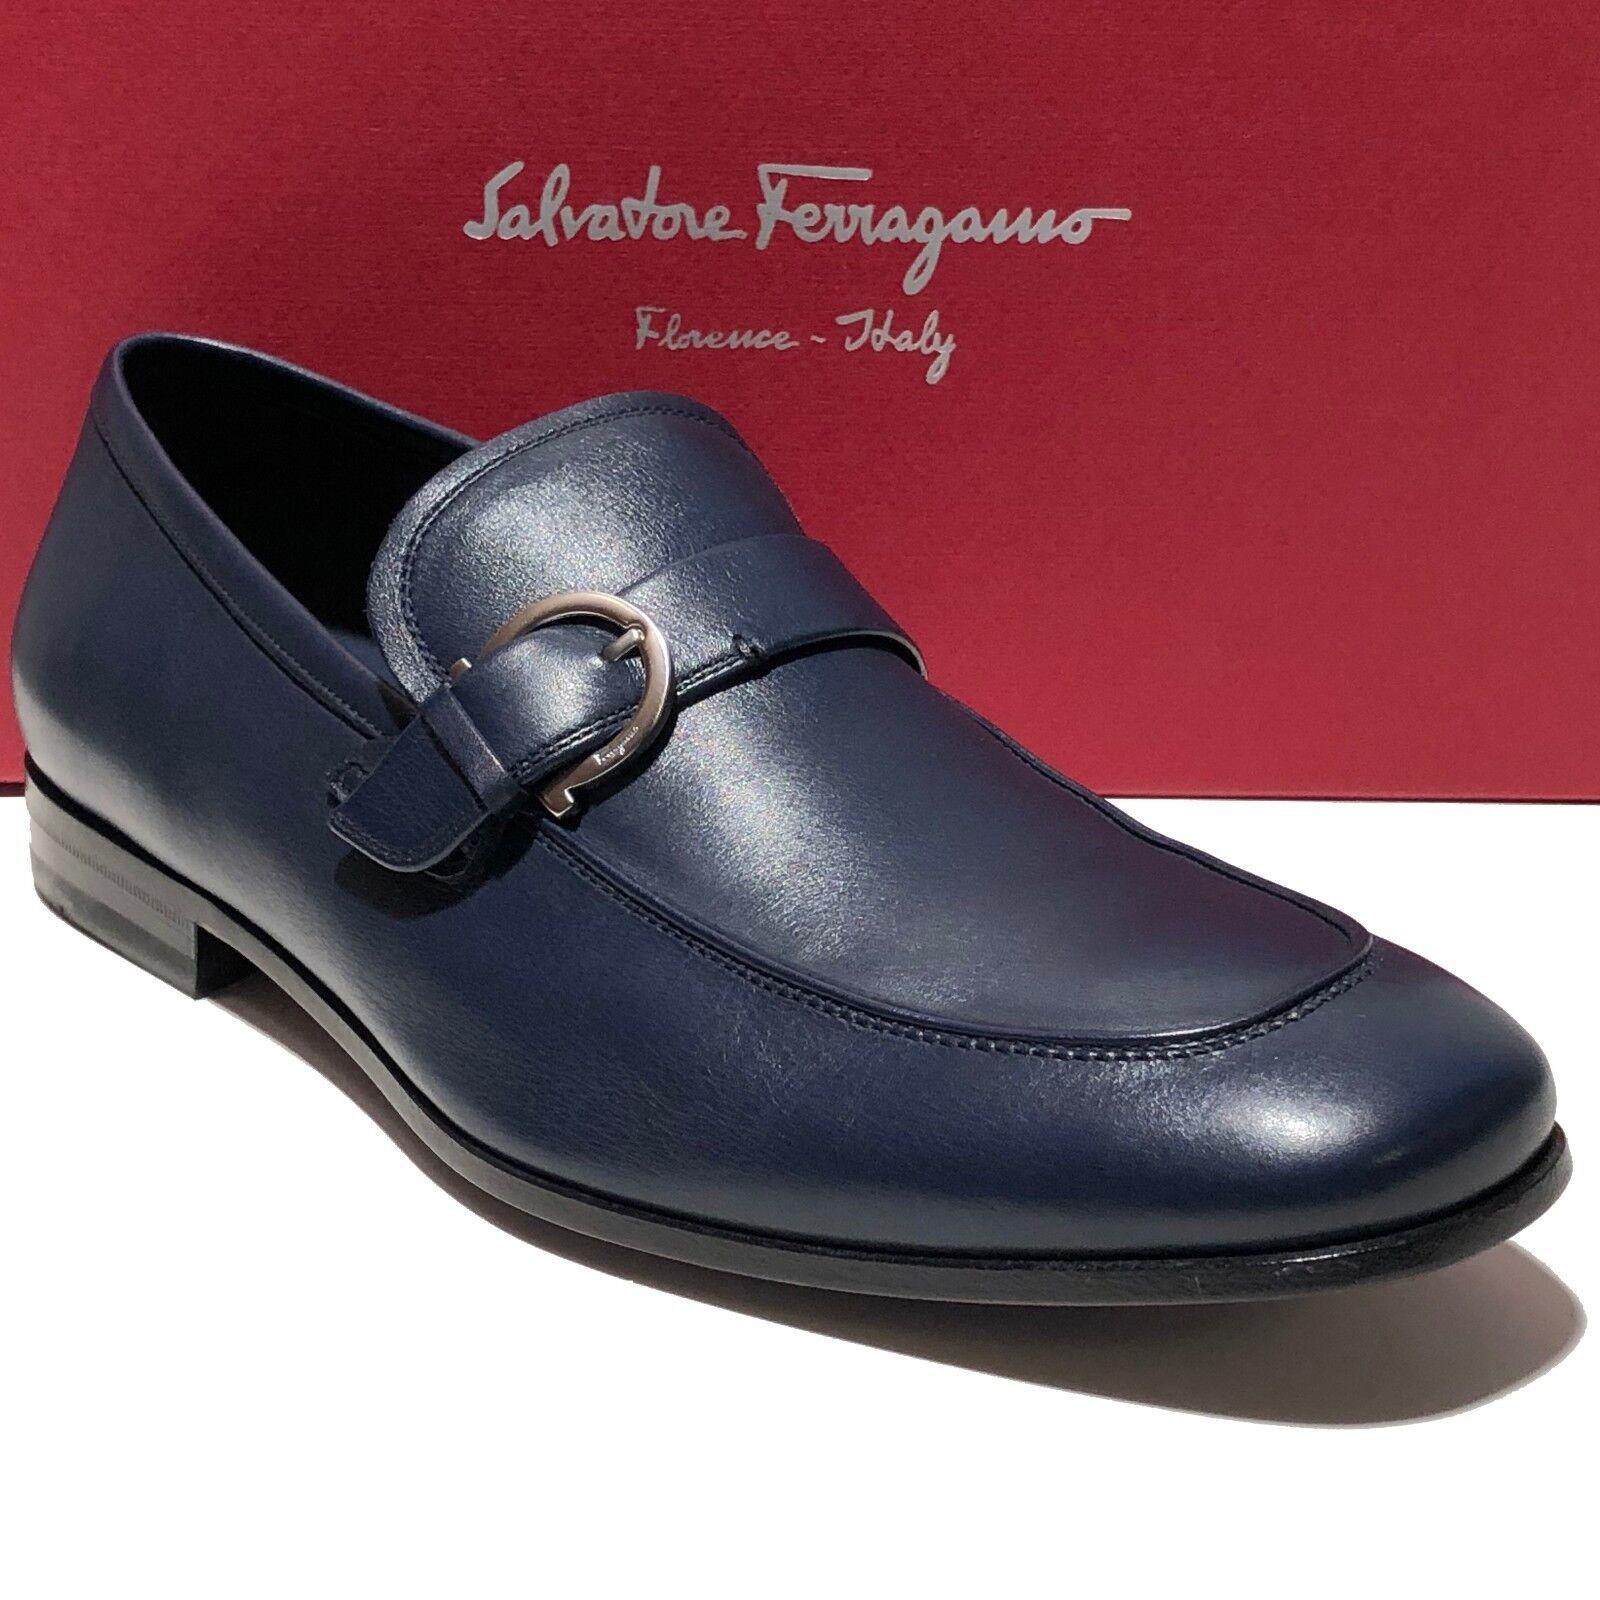 Ferragamo FARUK blu Gancini Bit Dress Loafers 10 D Men's Casual Moccasin Navy